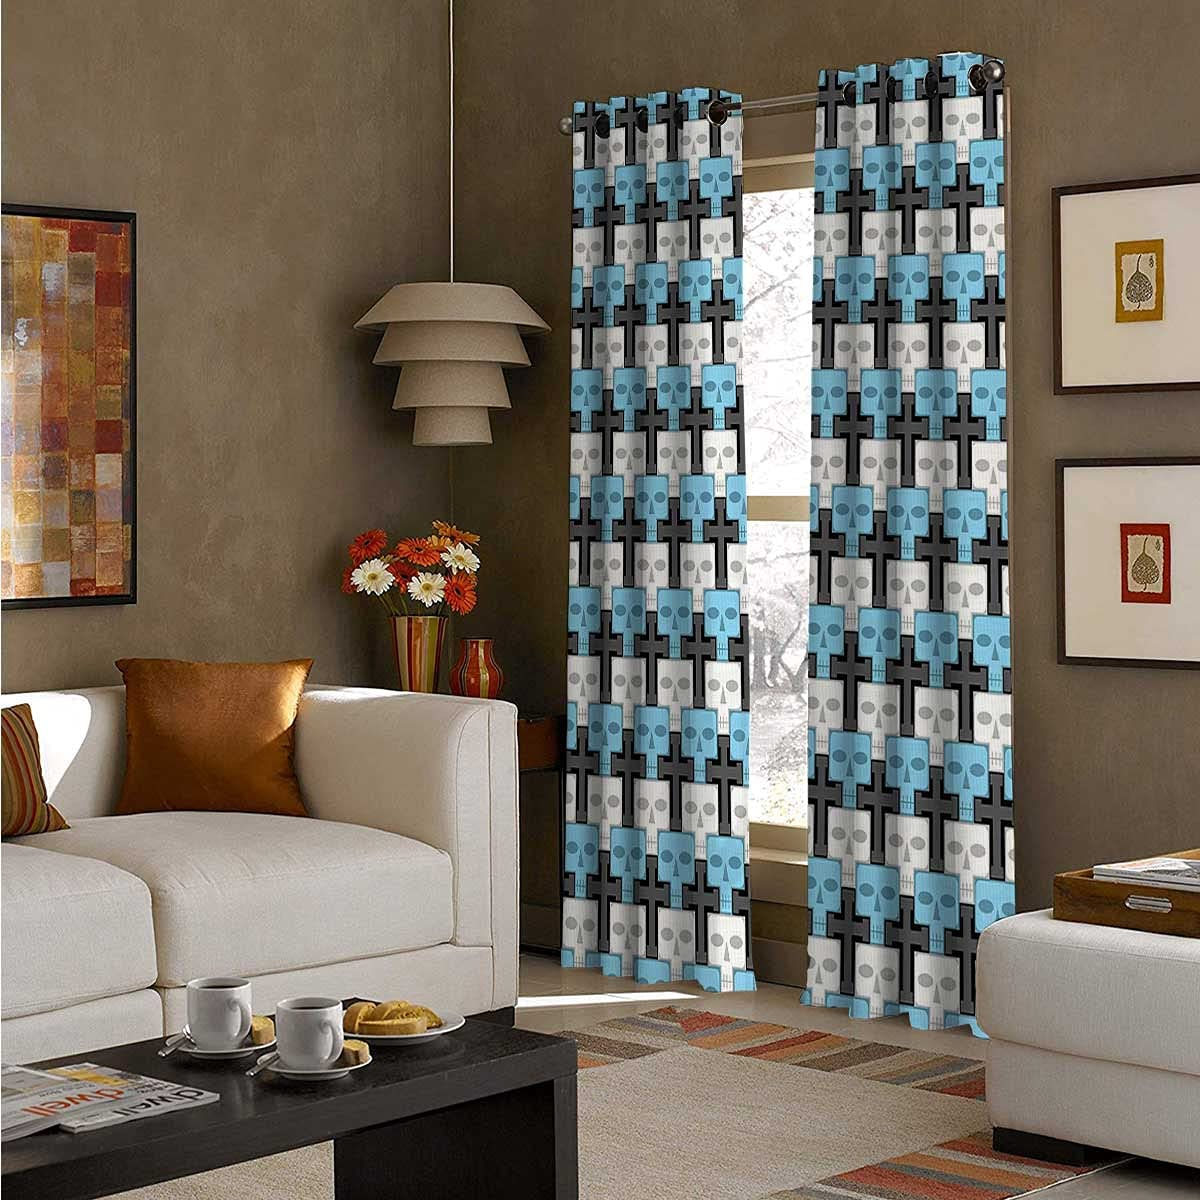 Modern Curtains 96 Inch Long Industry No. Max 62% OFF 1 Skulls Bedroom Gromm Blackout Kids